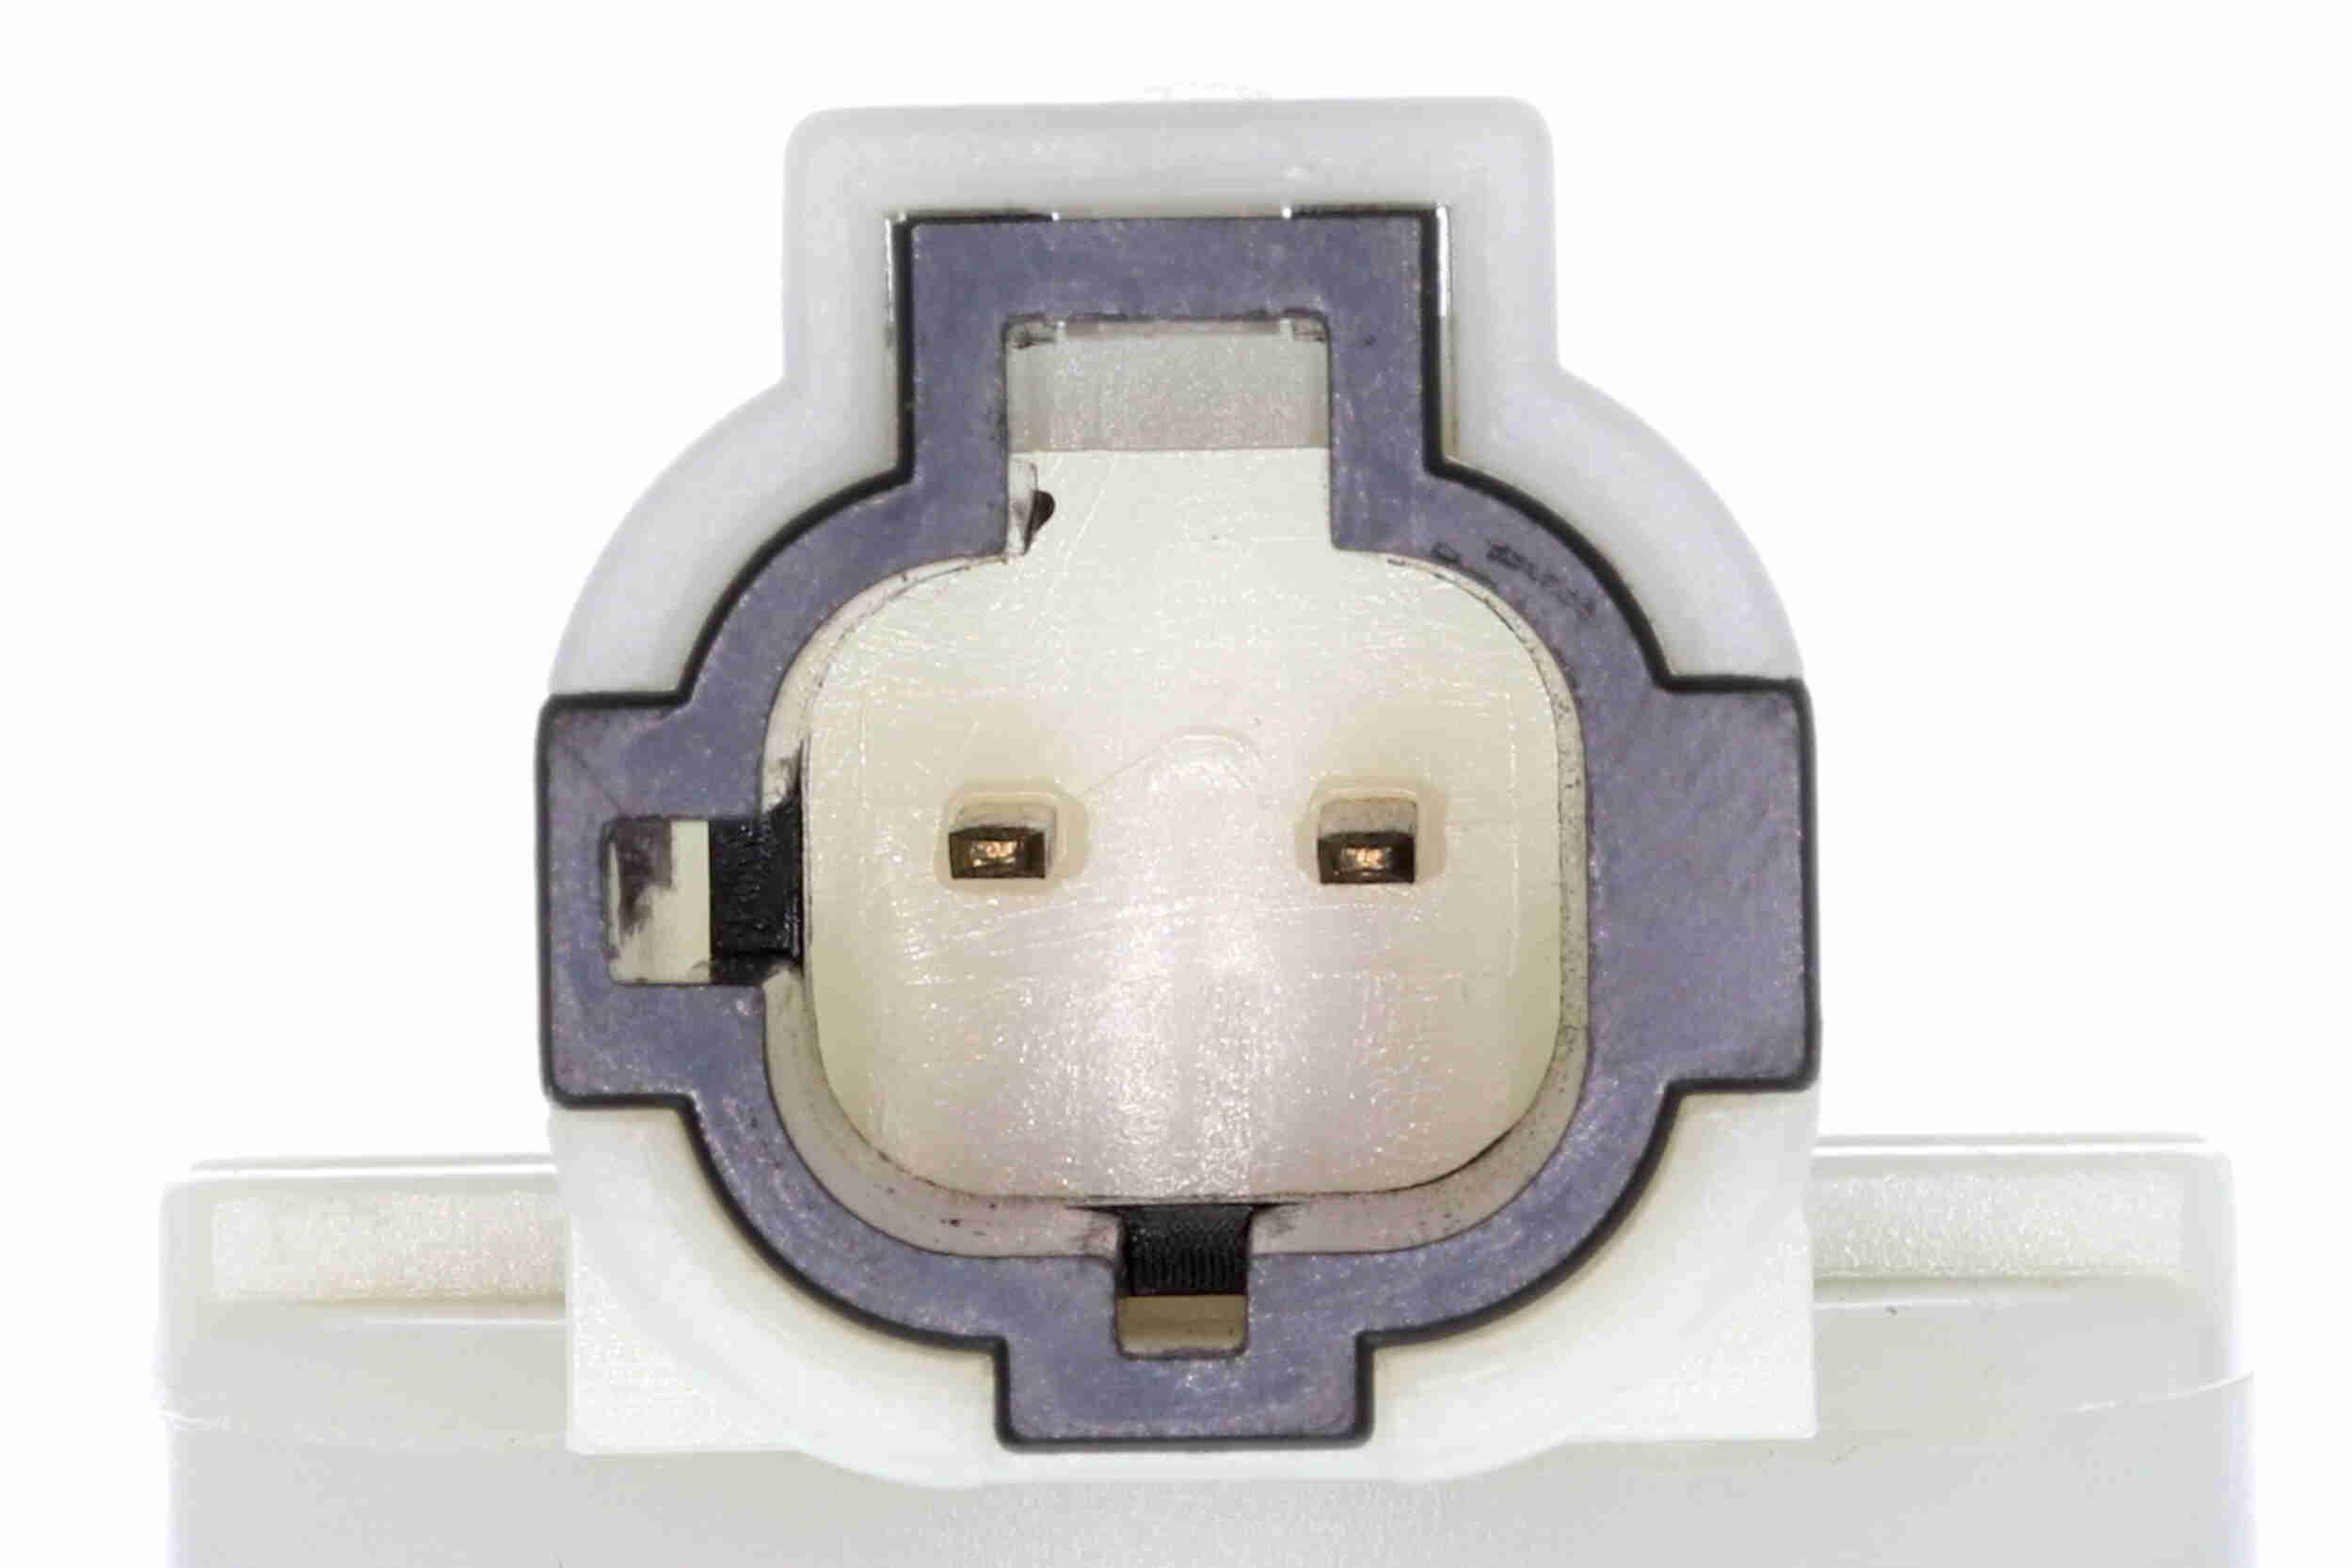 Scheibenwaschpumpe ACKOJA A38-08-0004 Bewertung